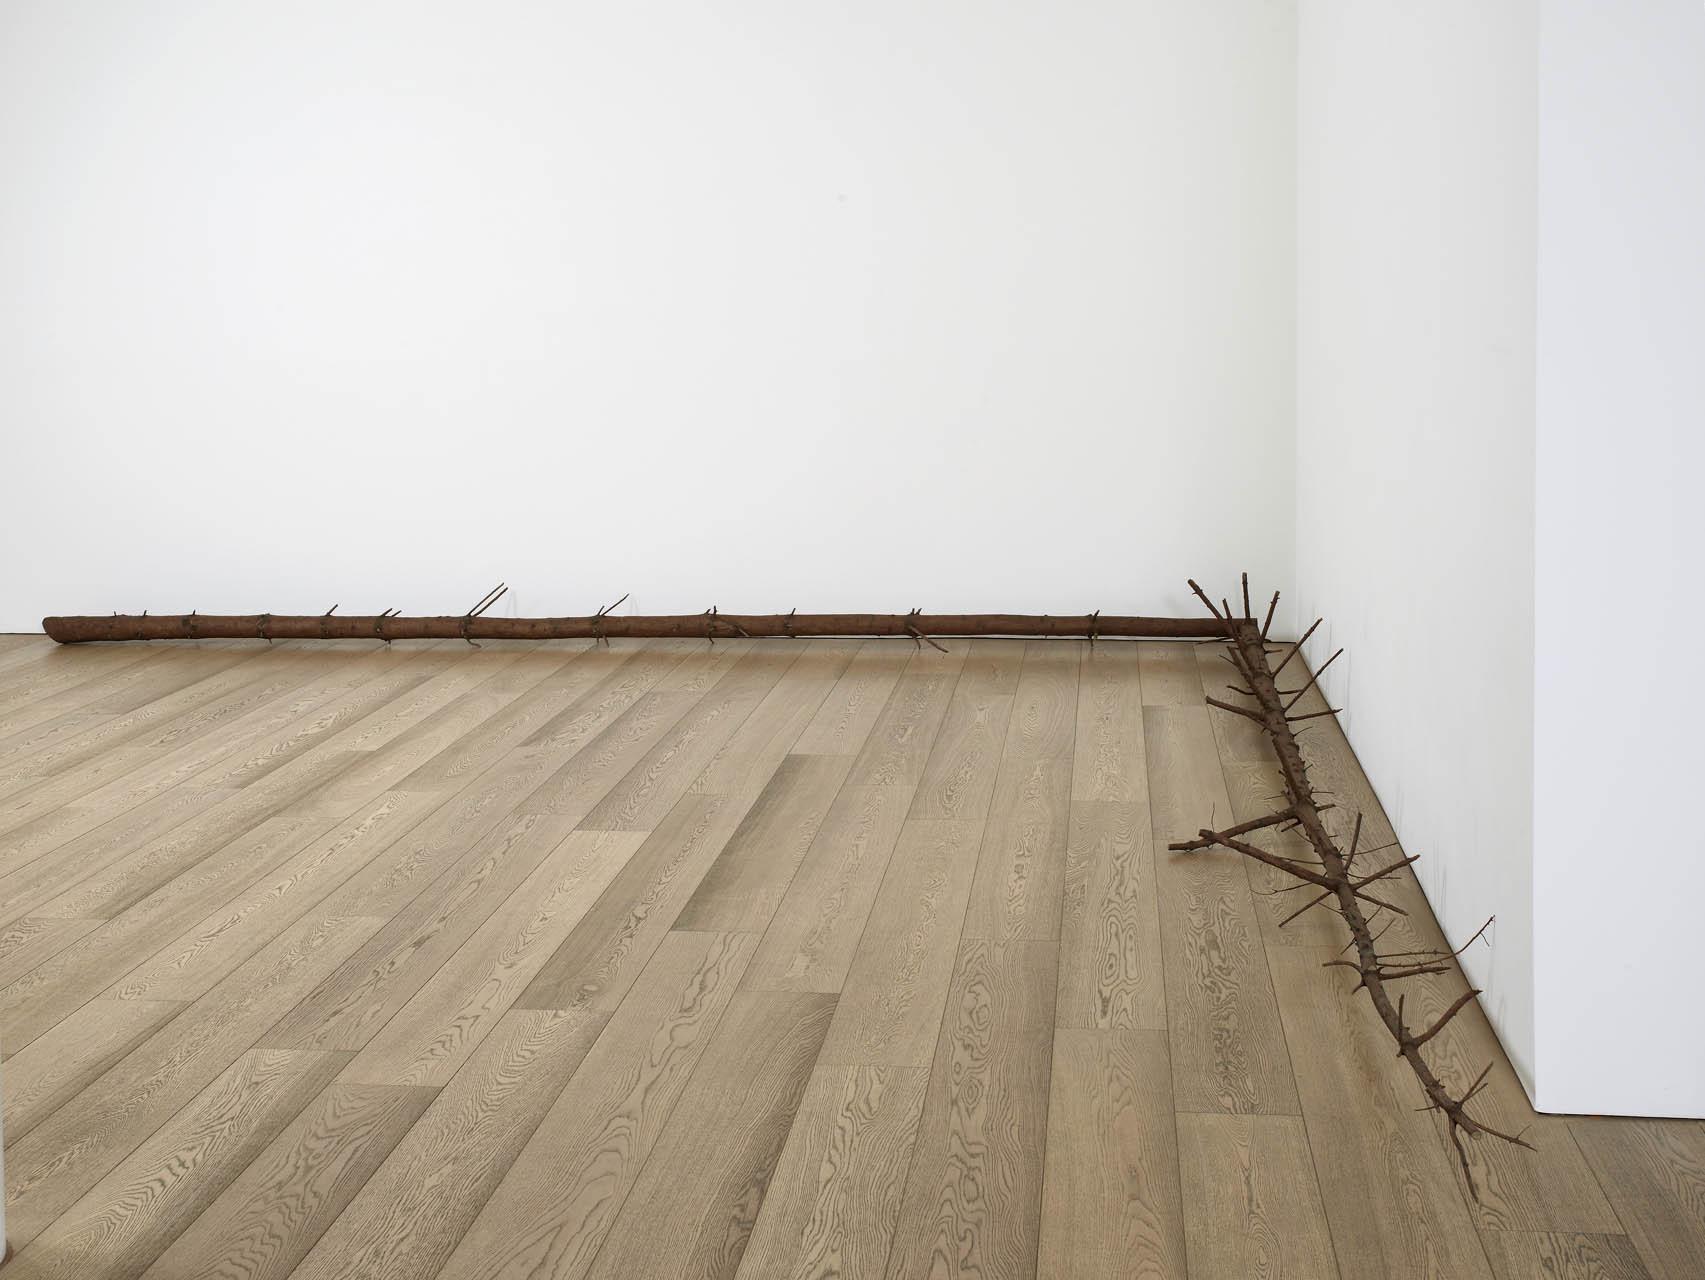 "<div class=""artwork_caption""><p>still.life. (pine tree laying in a corner), 2008</p></div>"